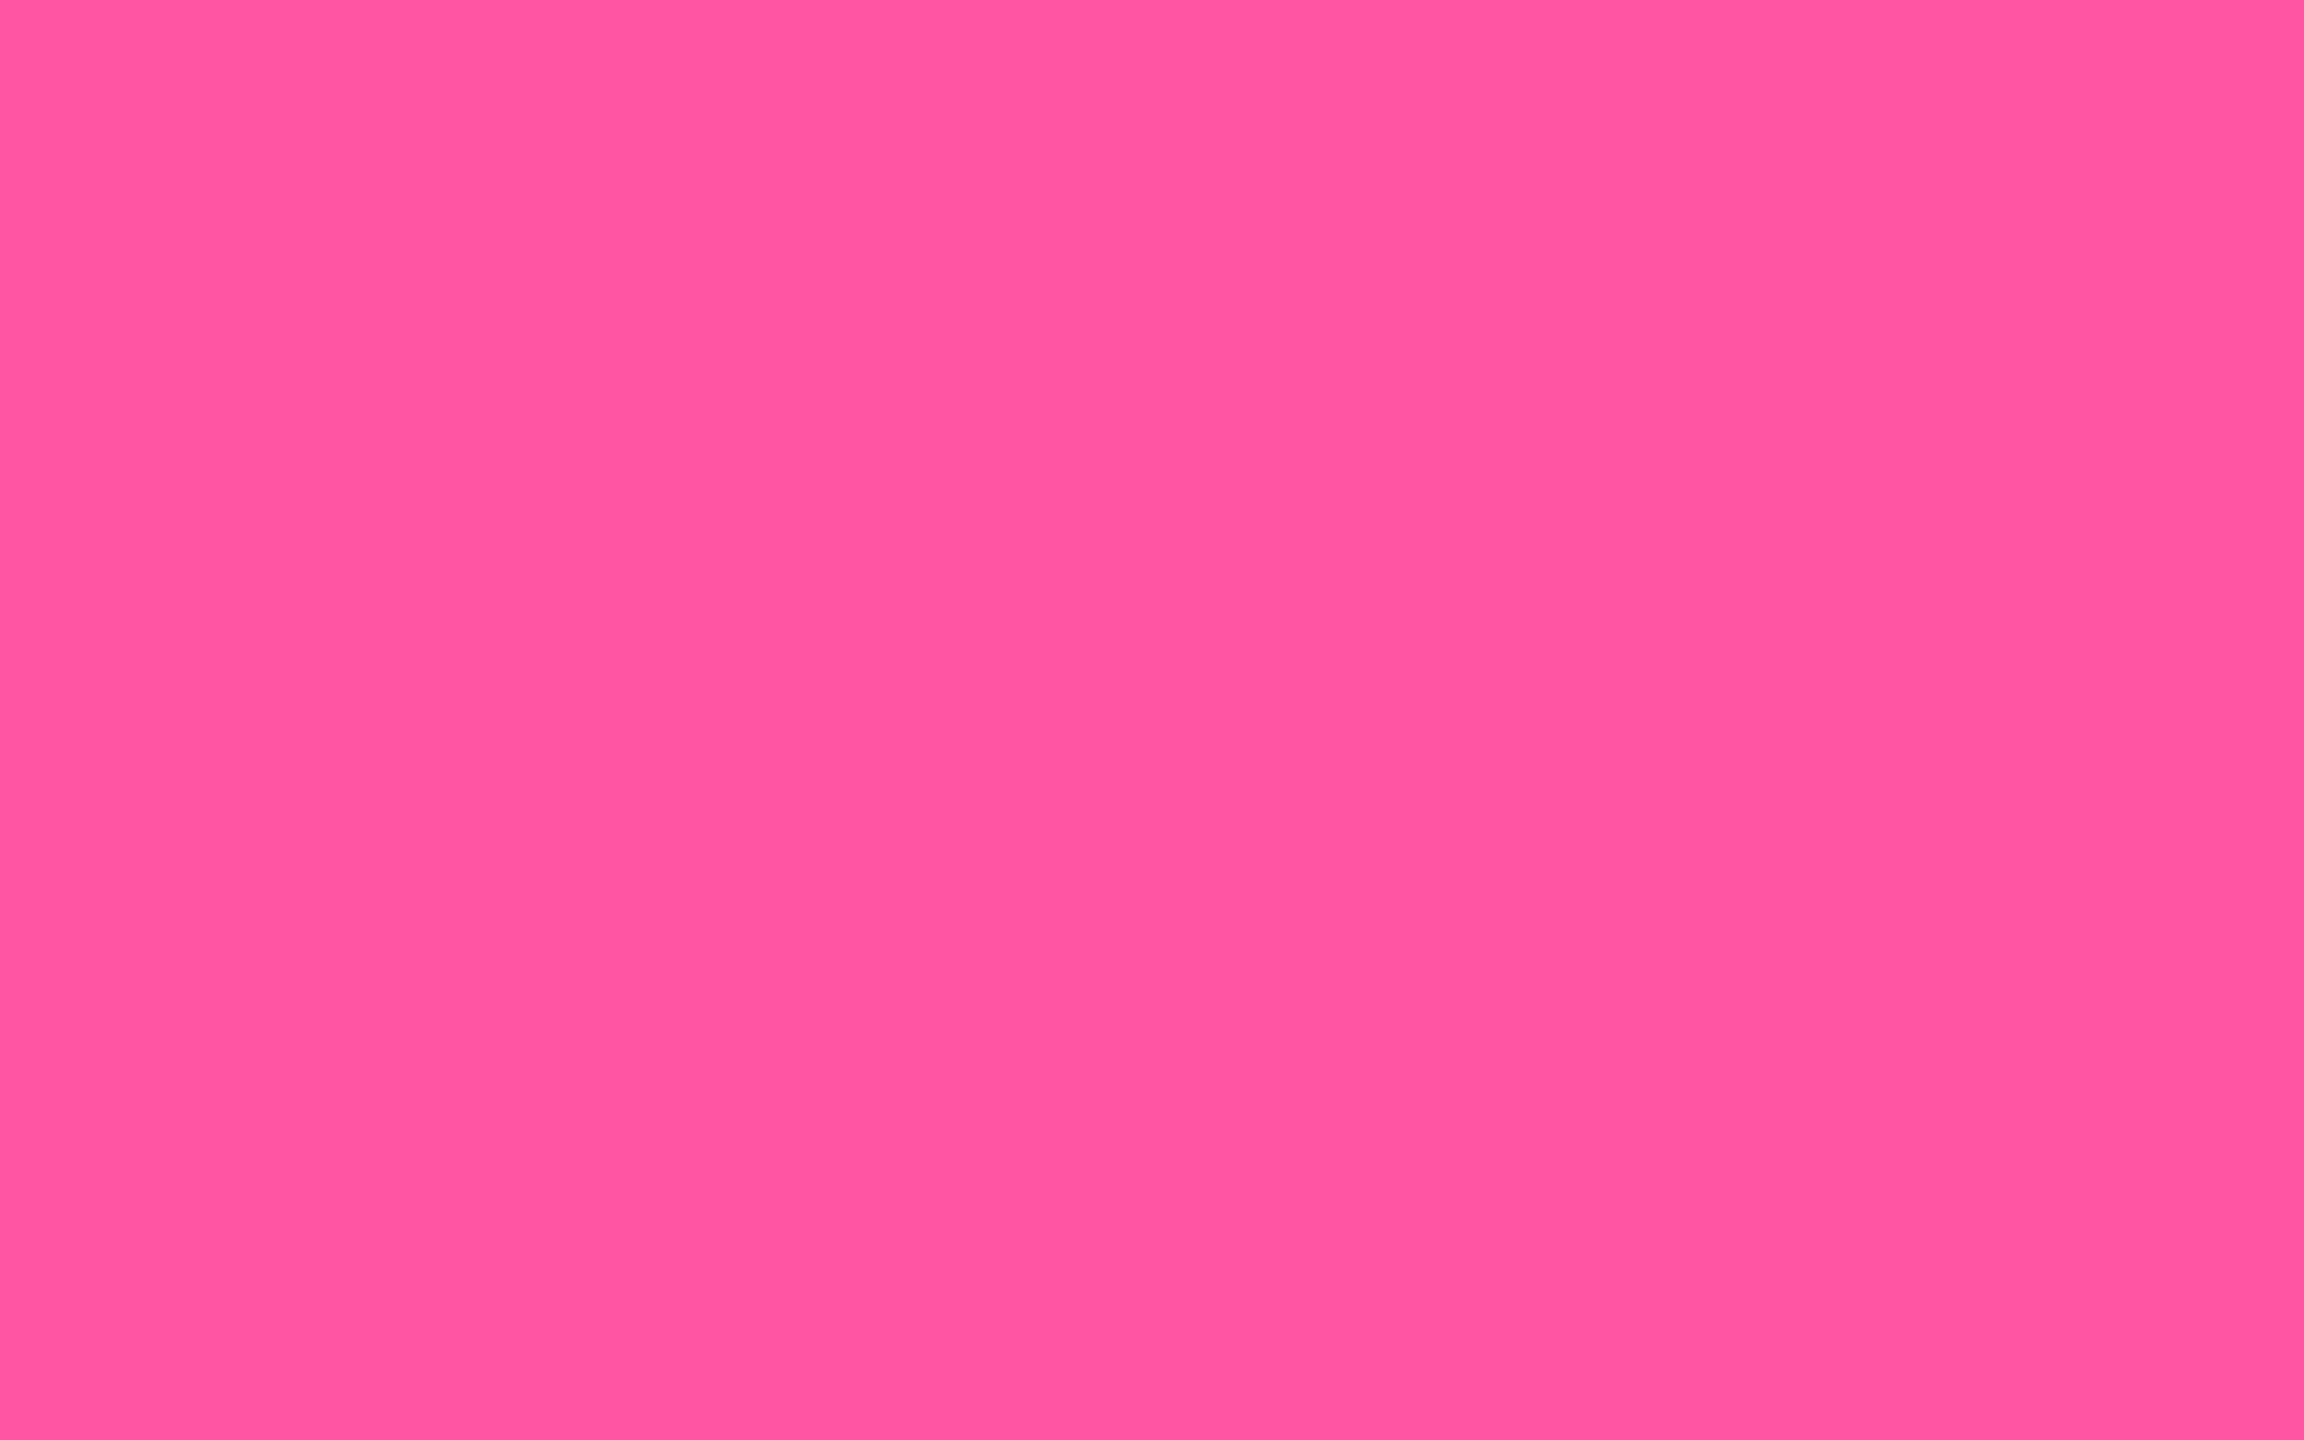 2304x1440 Brilliant Rose Solid Color Background